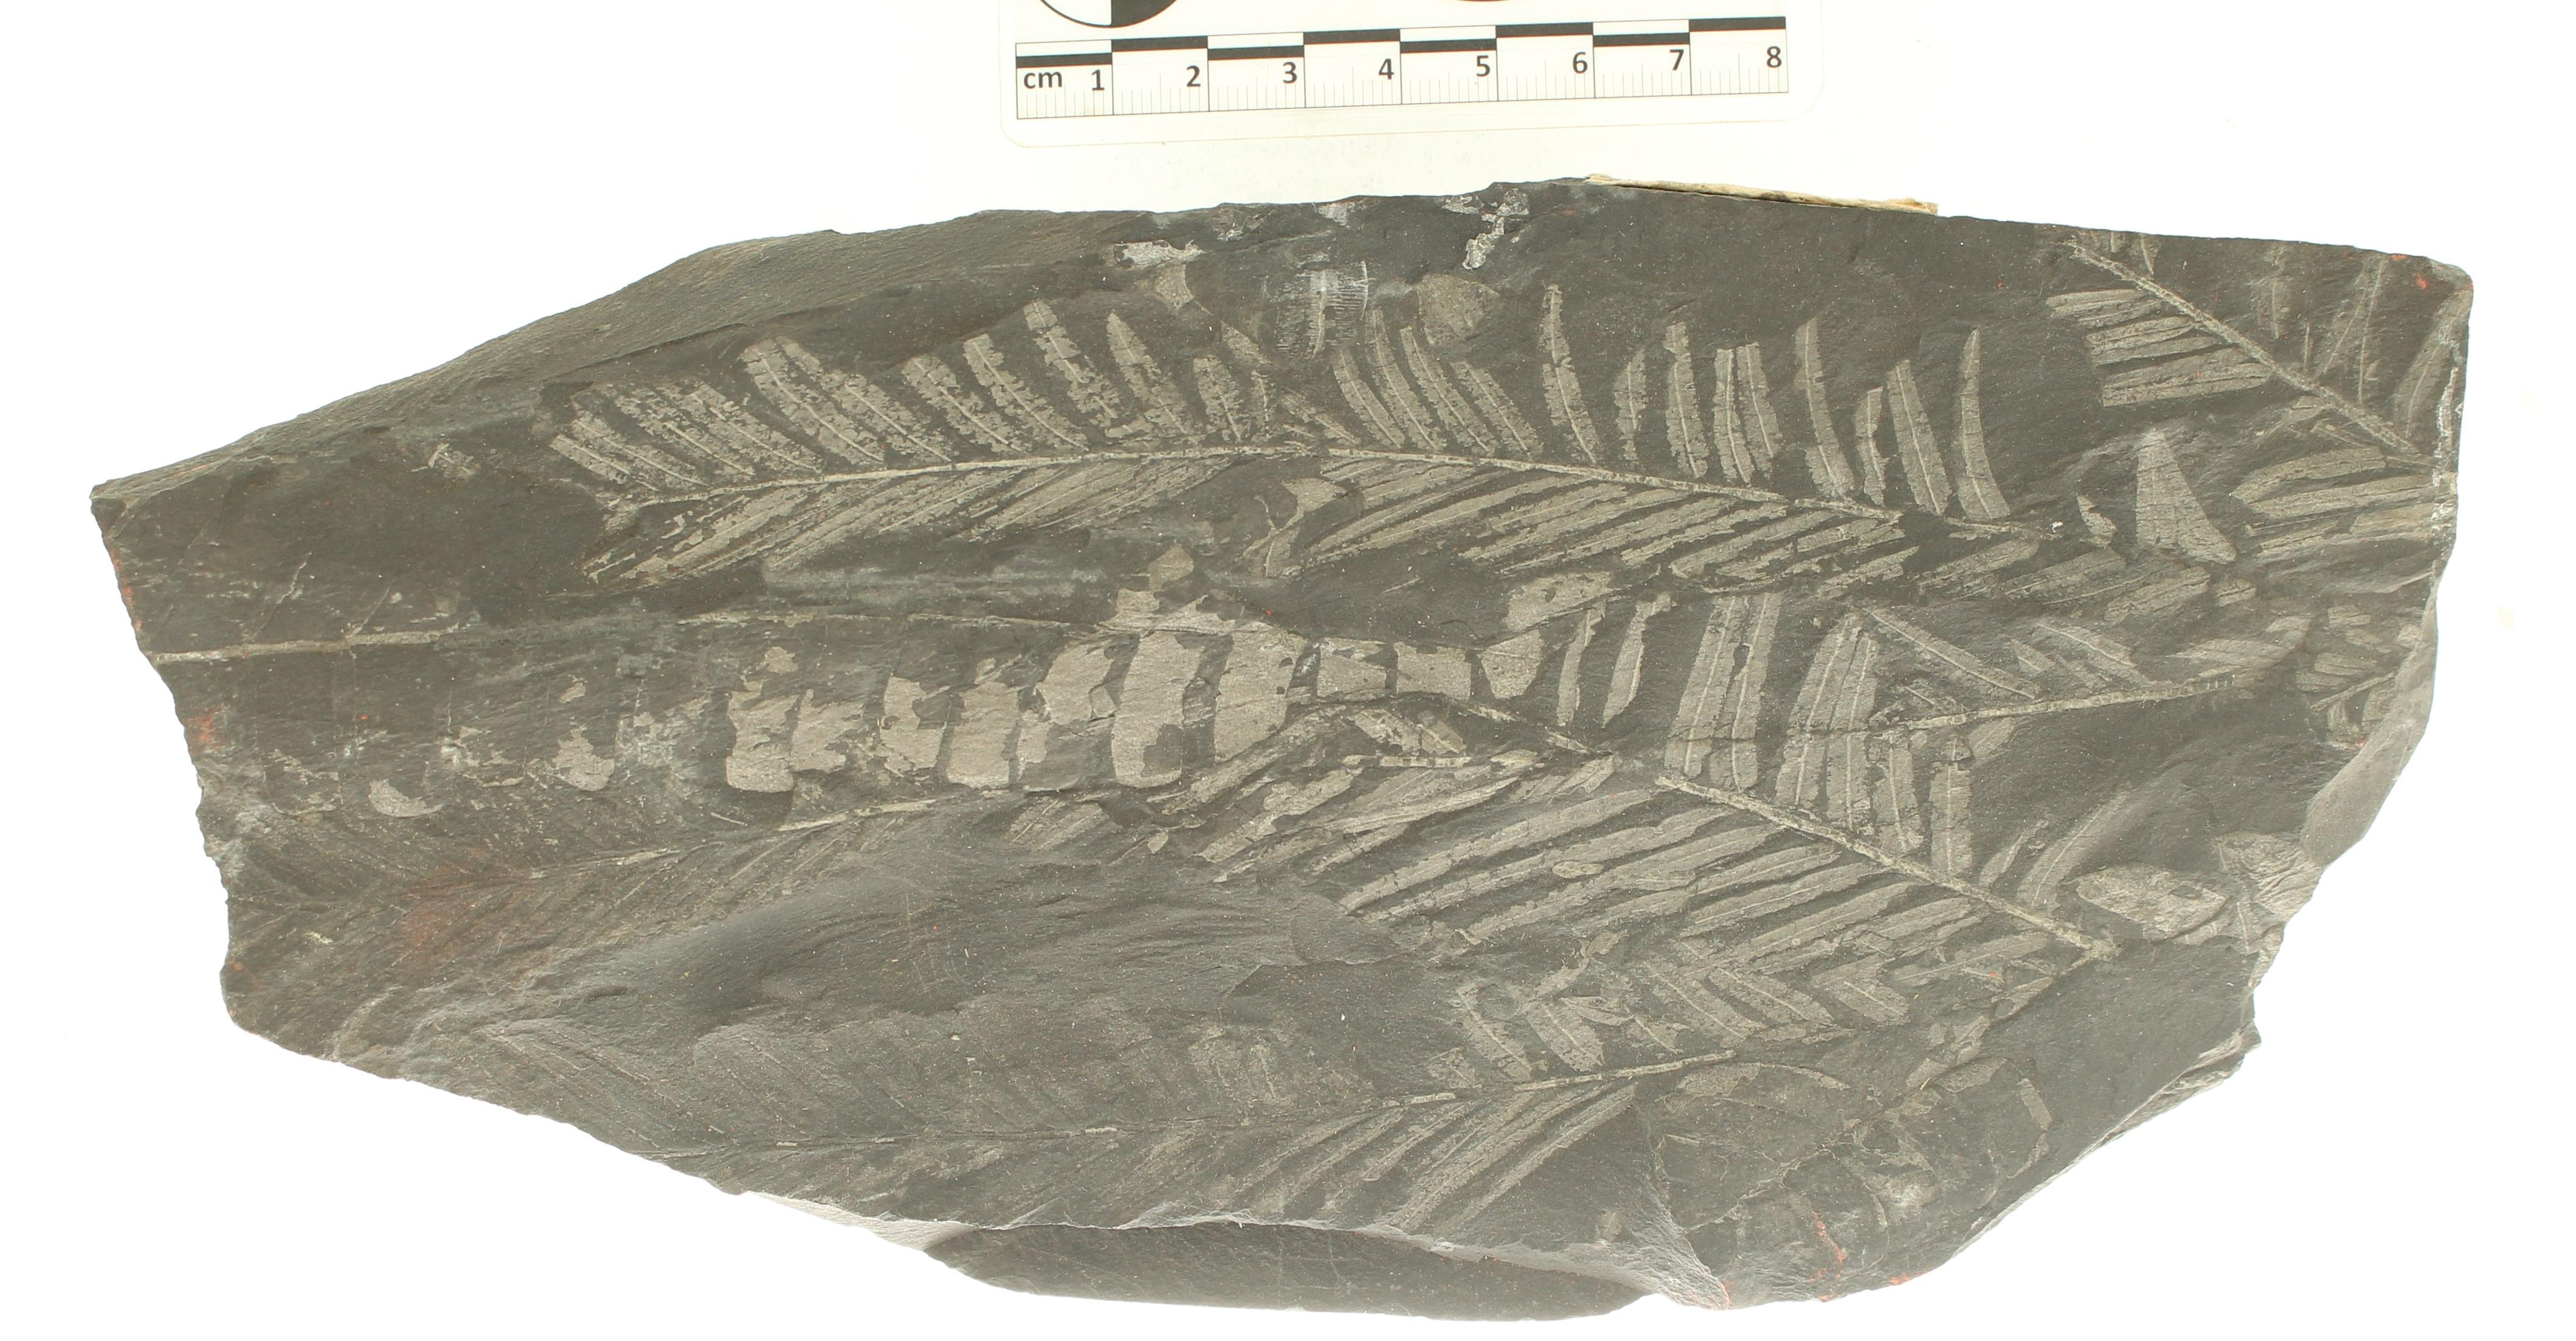 IRSNB b 8721 - Detail